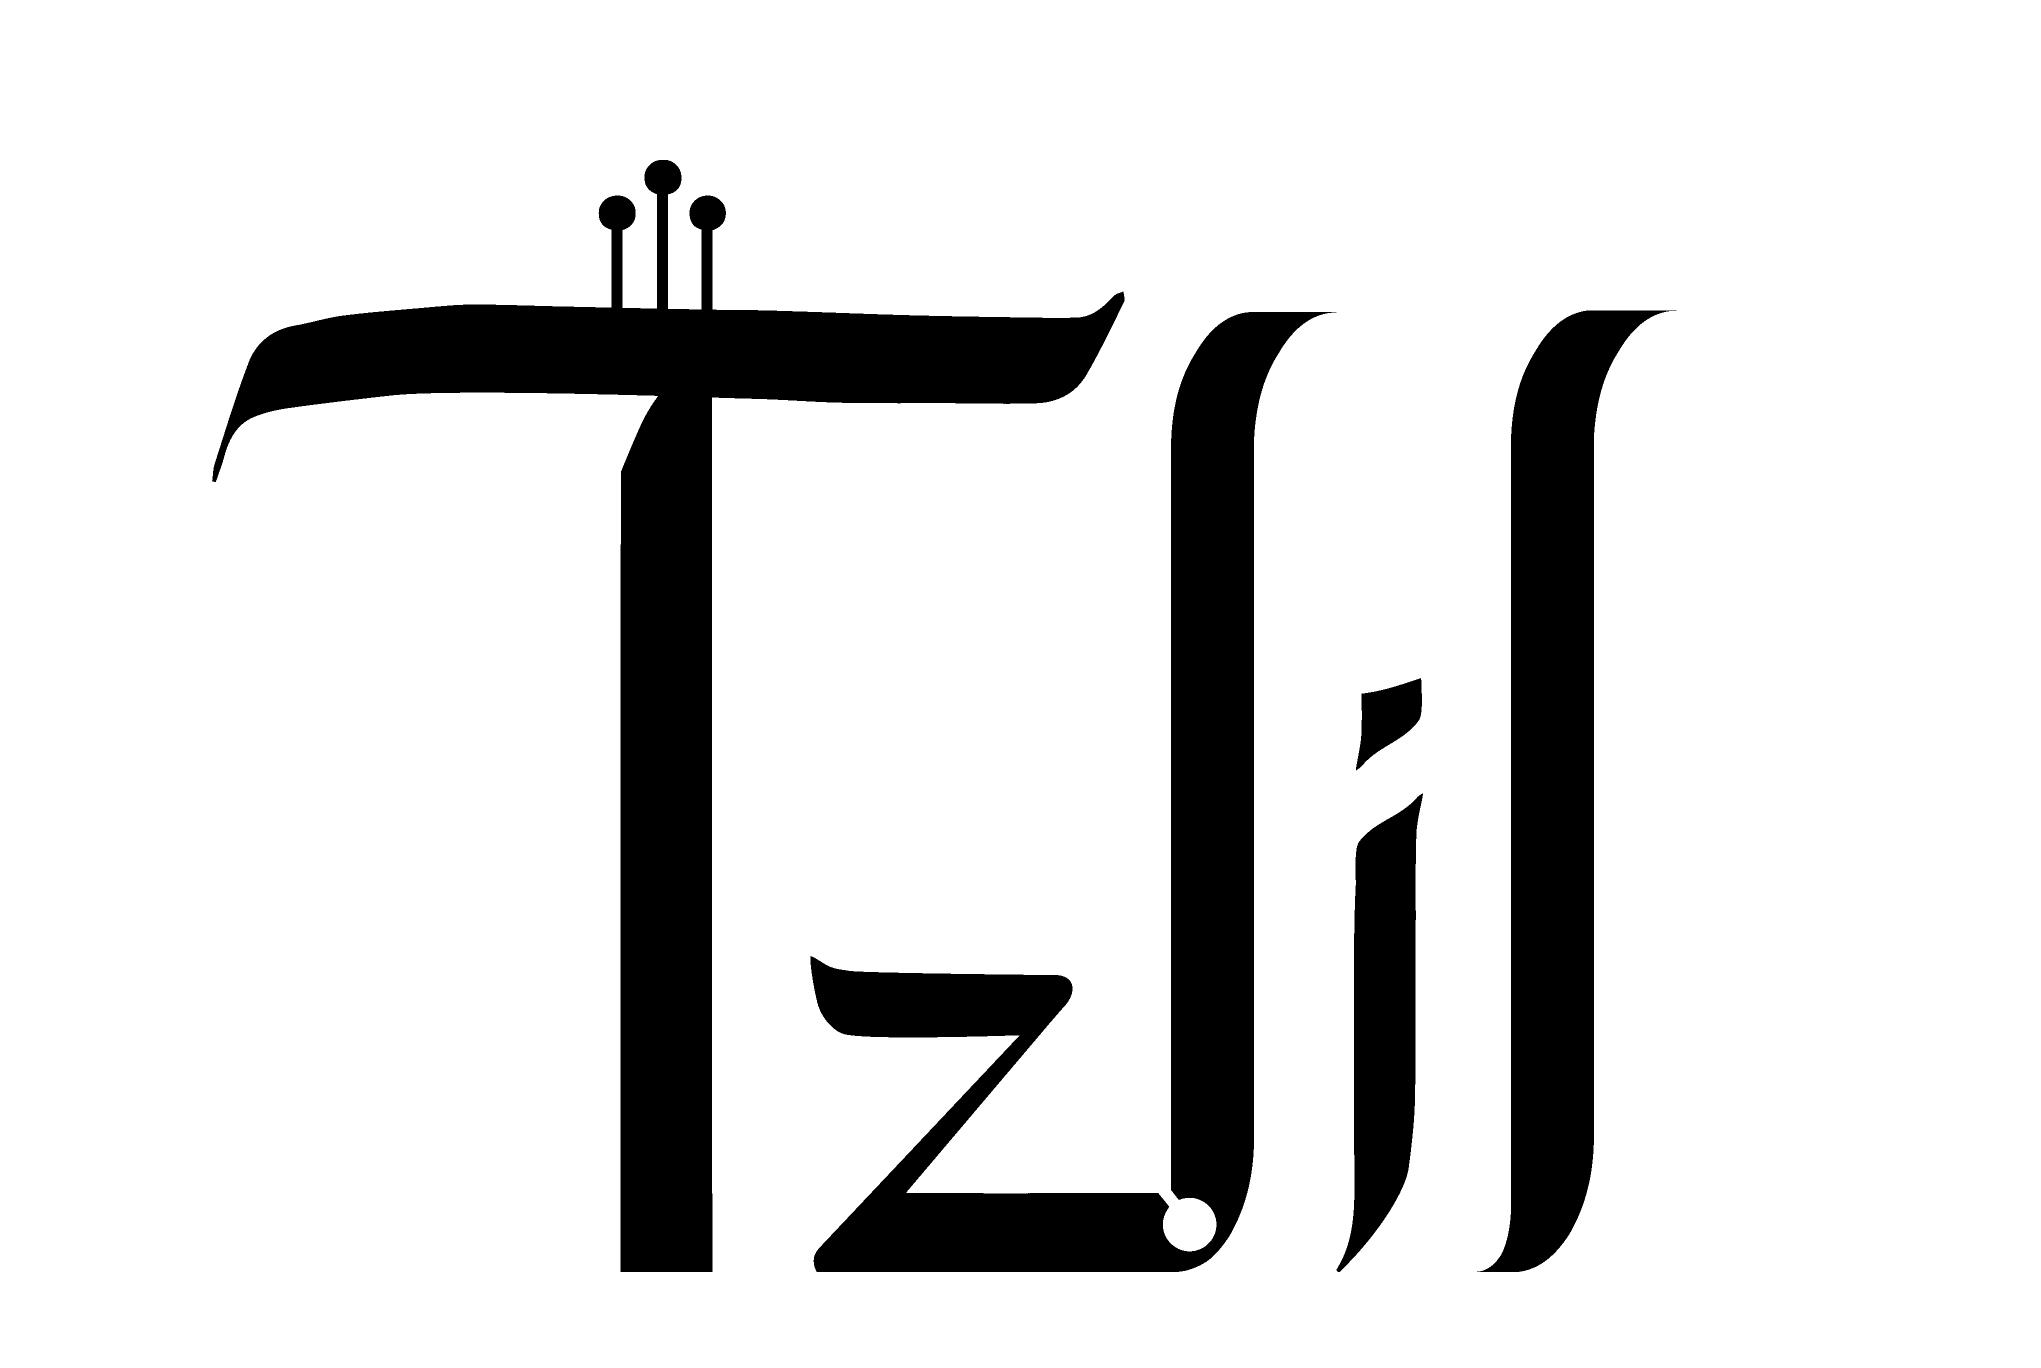 TZLIL (Tzlil Danin) - musician